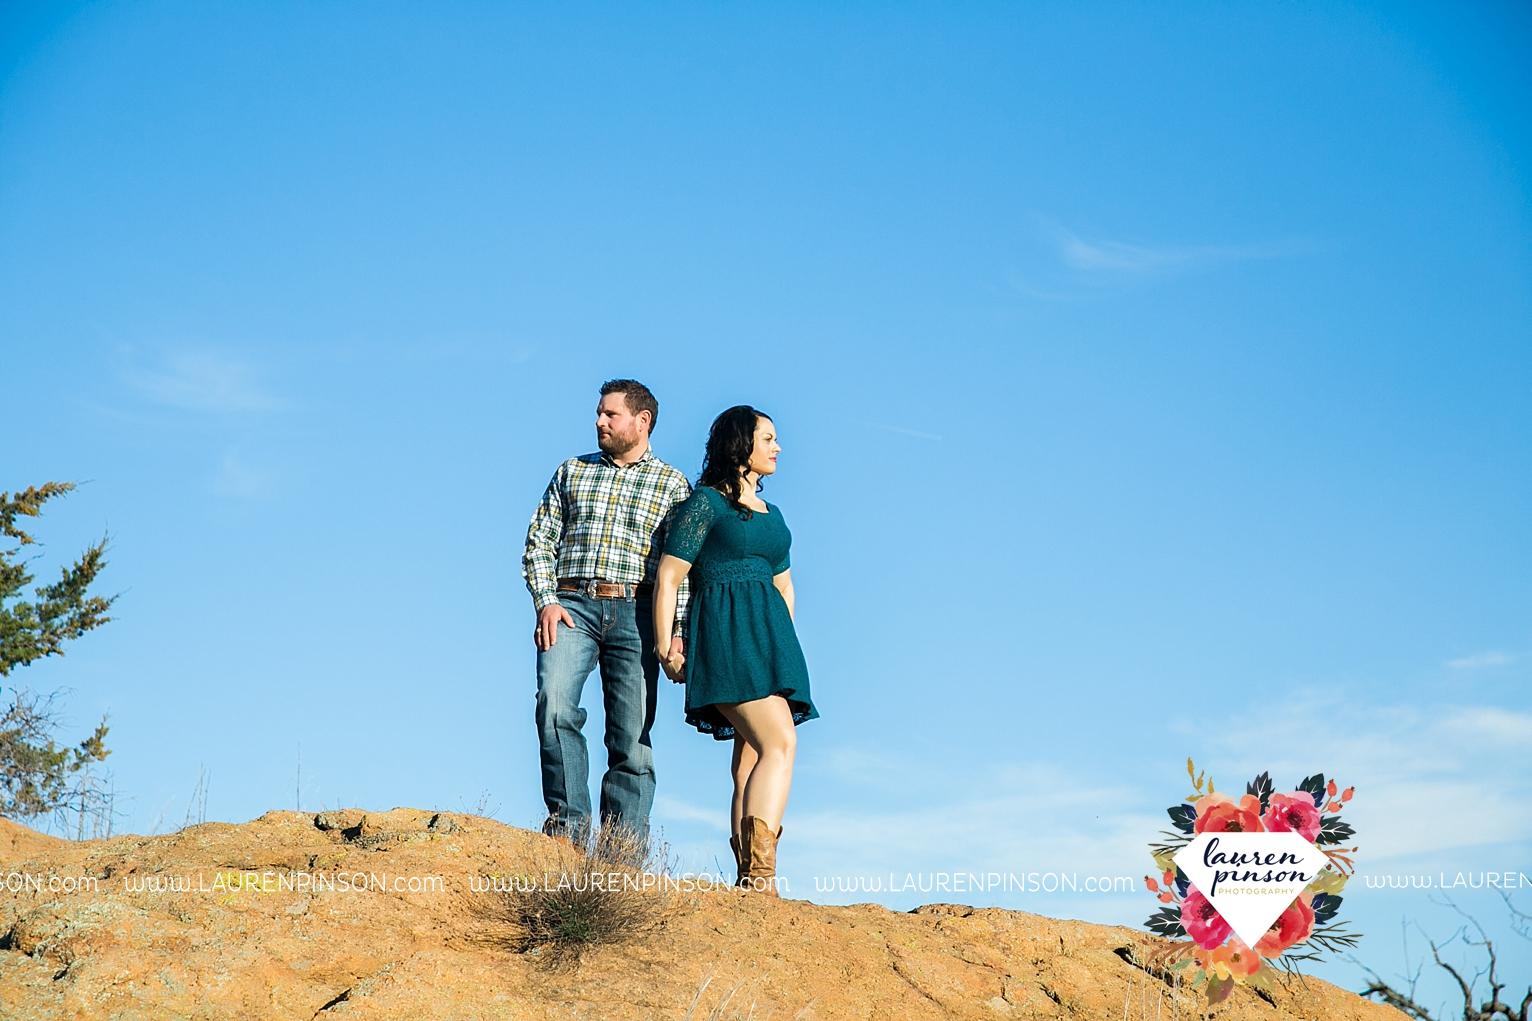 wichita-falls-texas-engagement-photographer-wedding-oklahoma-lawton-wichita-mountains-refuge-outdoors-mountains-engaged_2052.jpg